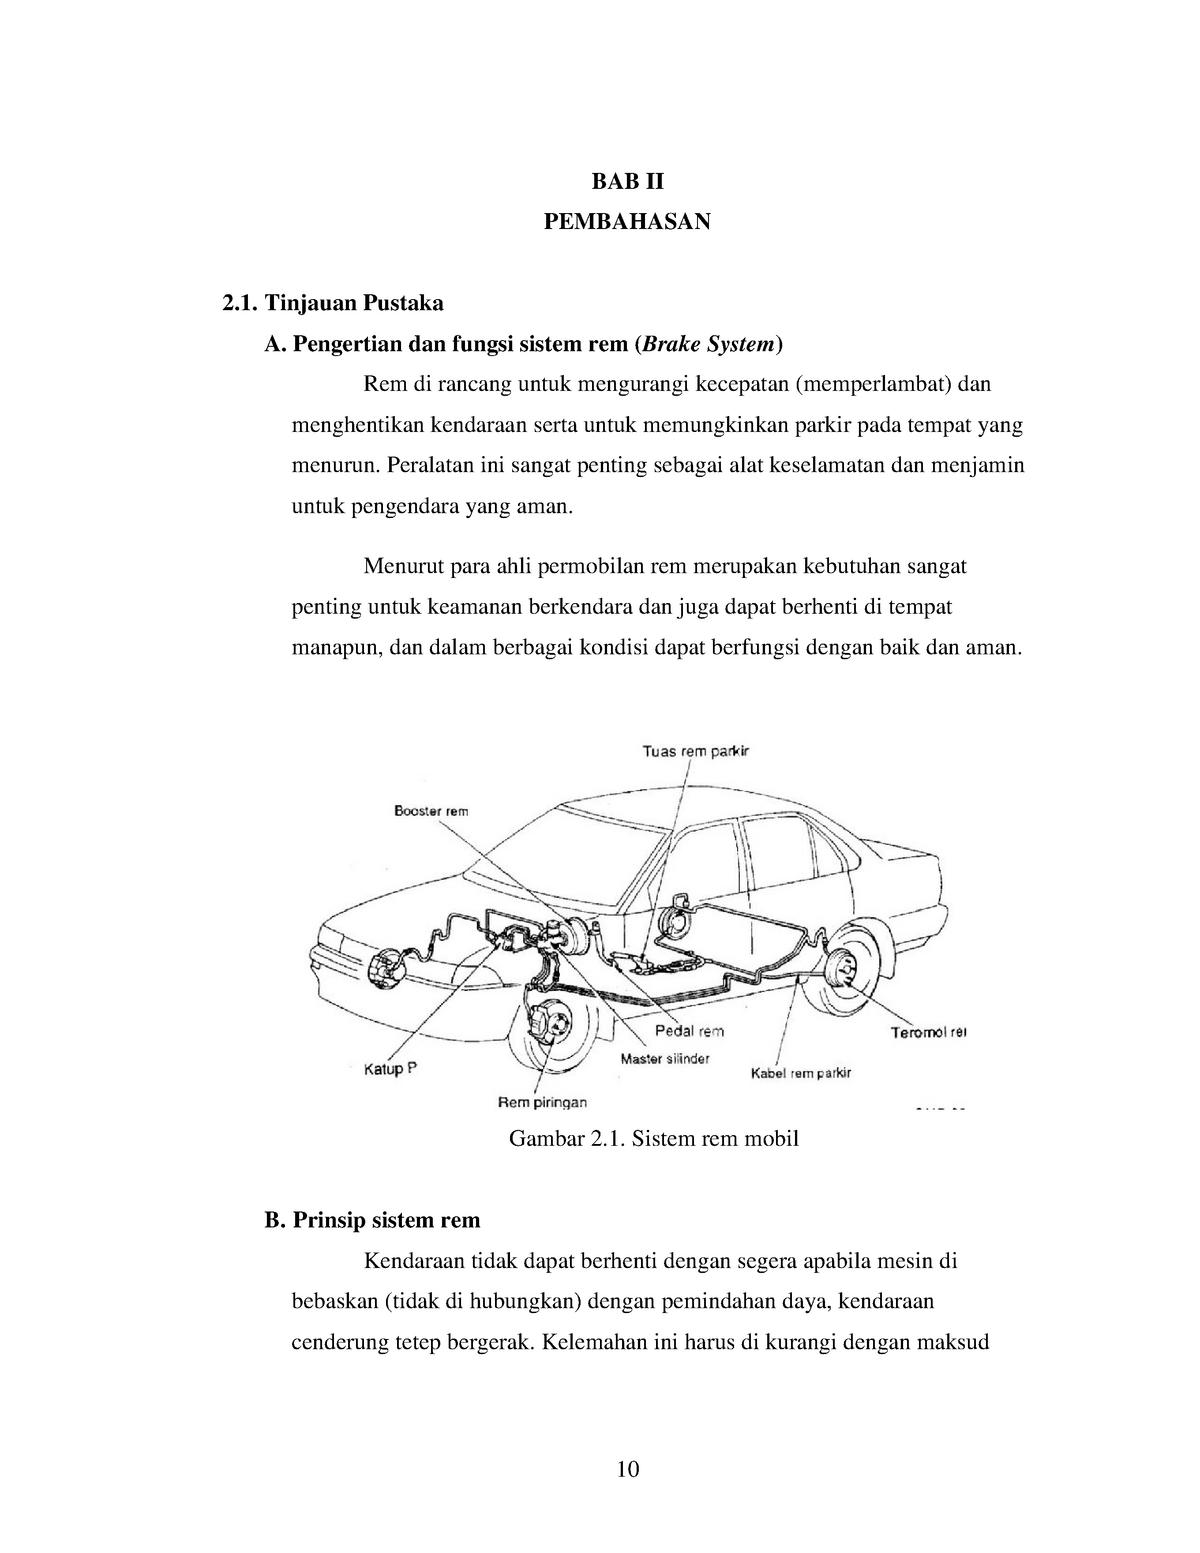 Bab Ii Pembahasan Tentang Systen Pengereman Pada Kendaraan